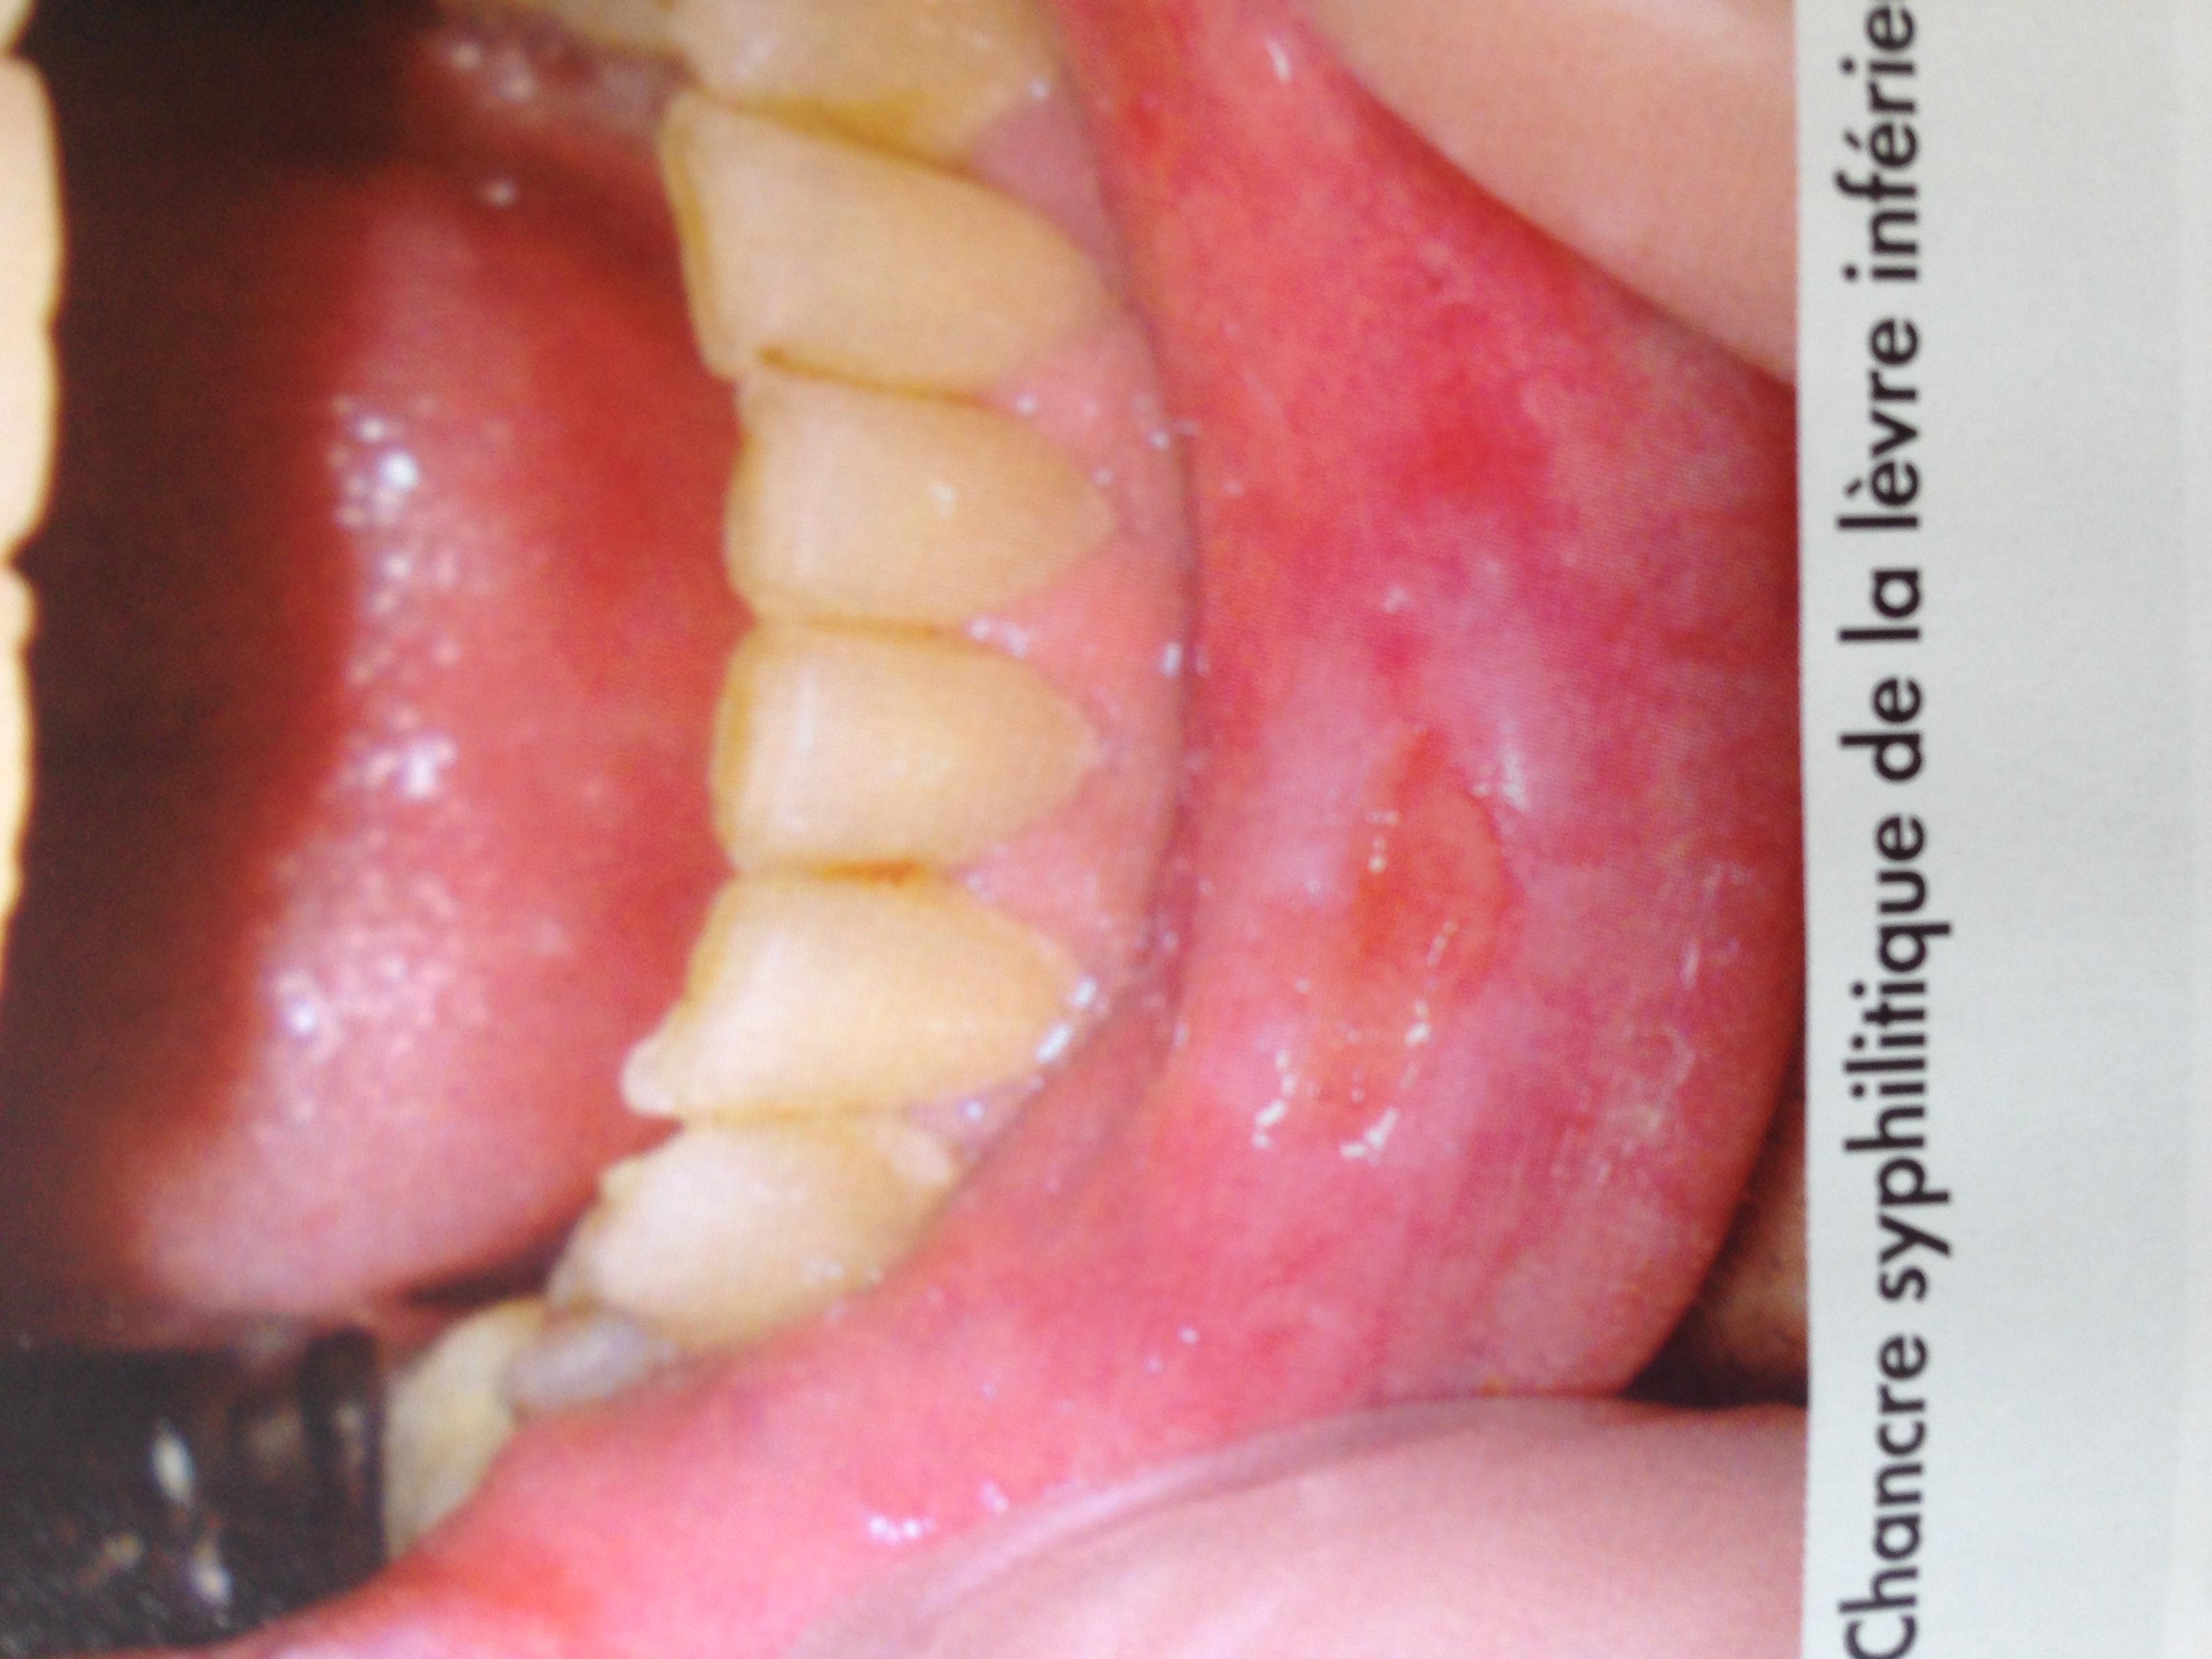 papillomavirus bouche image que significa lsil hpv